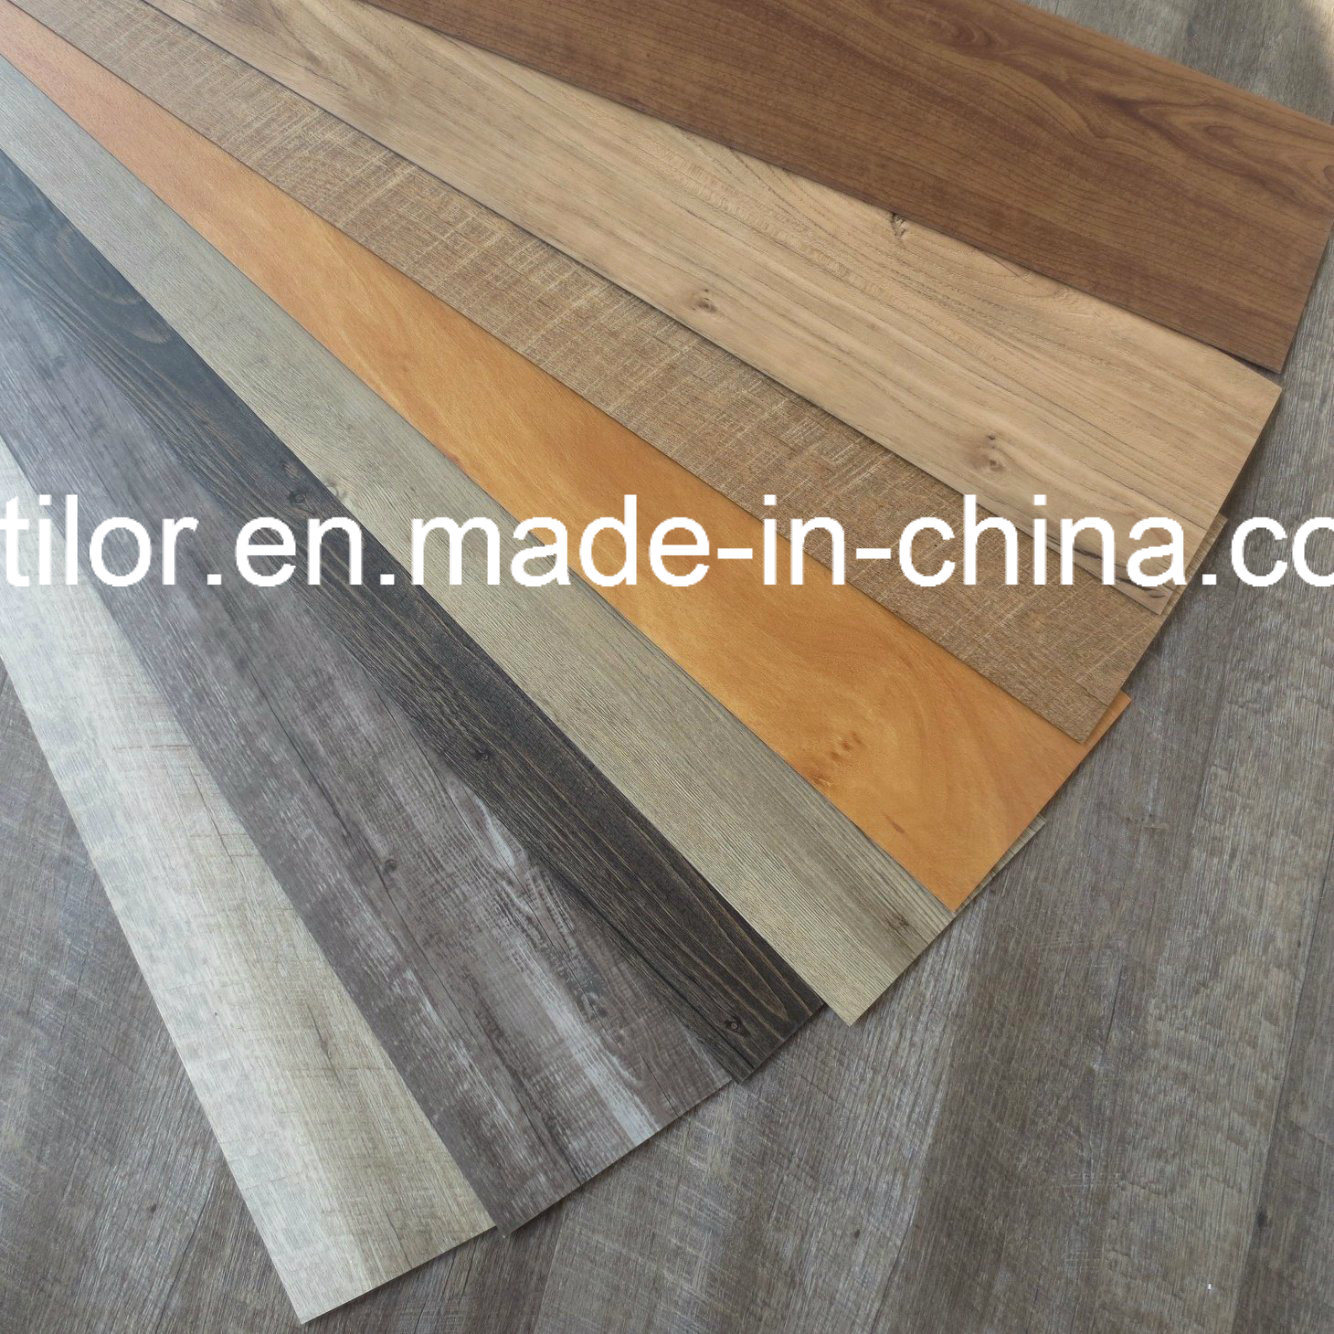 China Pvc Lvt Dry Back Glue Down Vinyl Floor Tiles Pvc Flooring